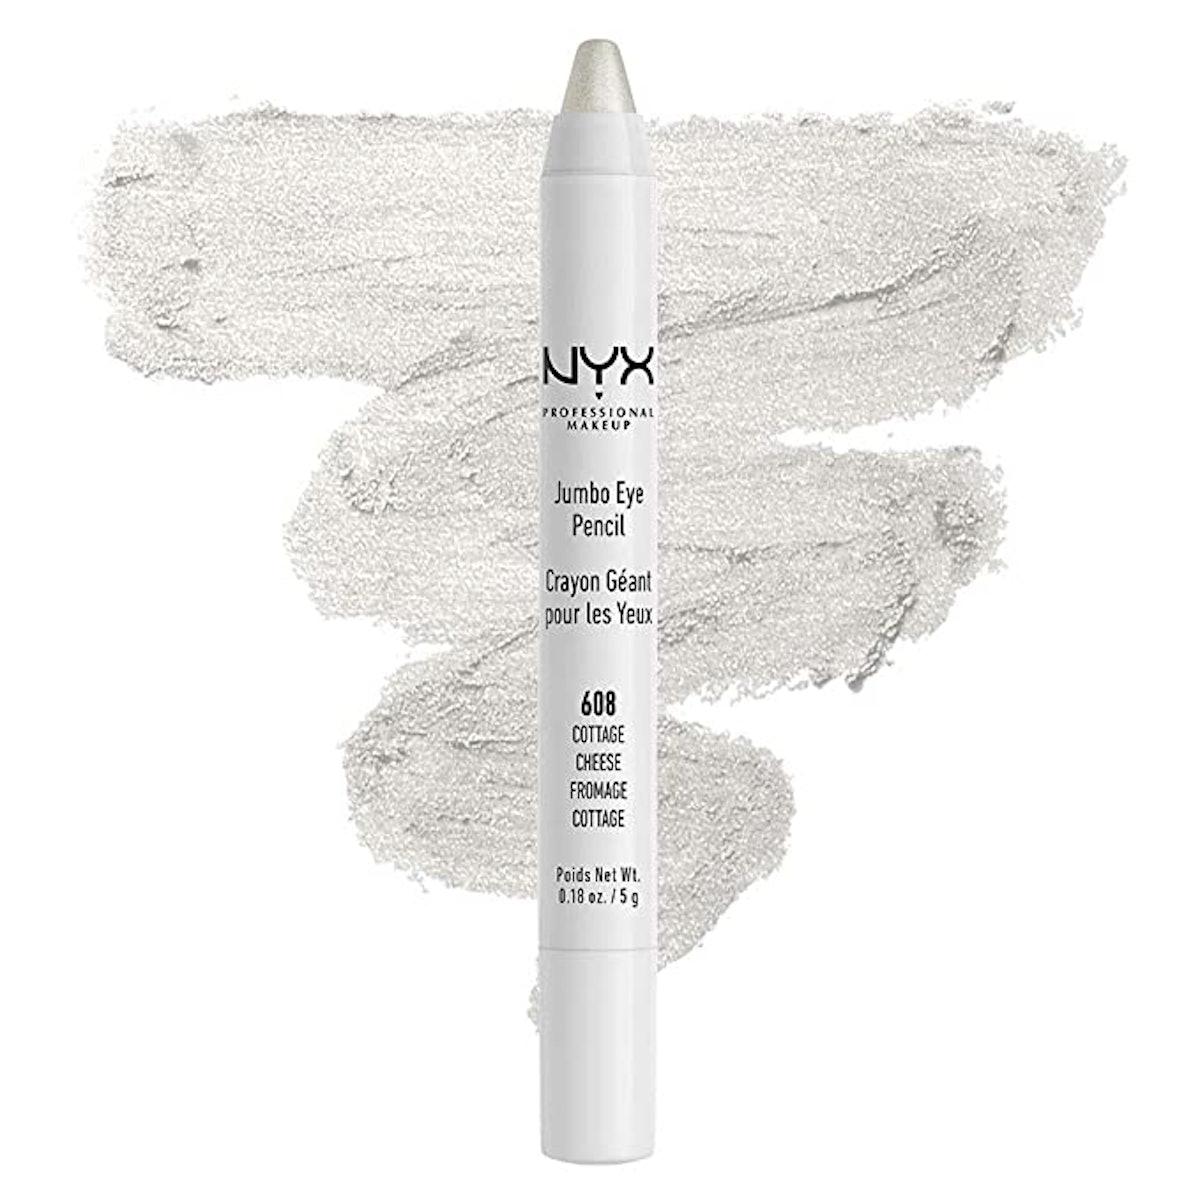 NYX Professional Makeup Jumbo Eyeliner Pencil